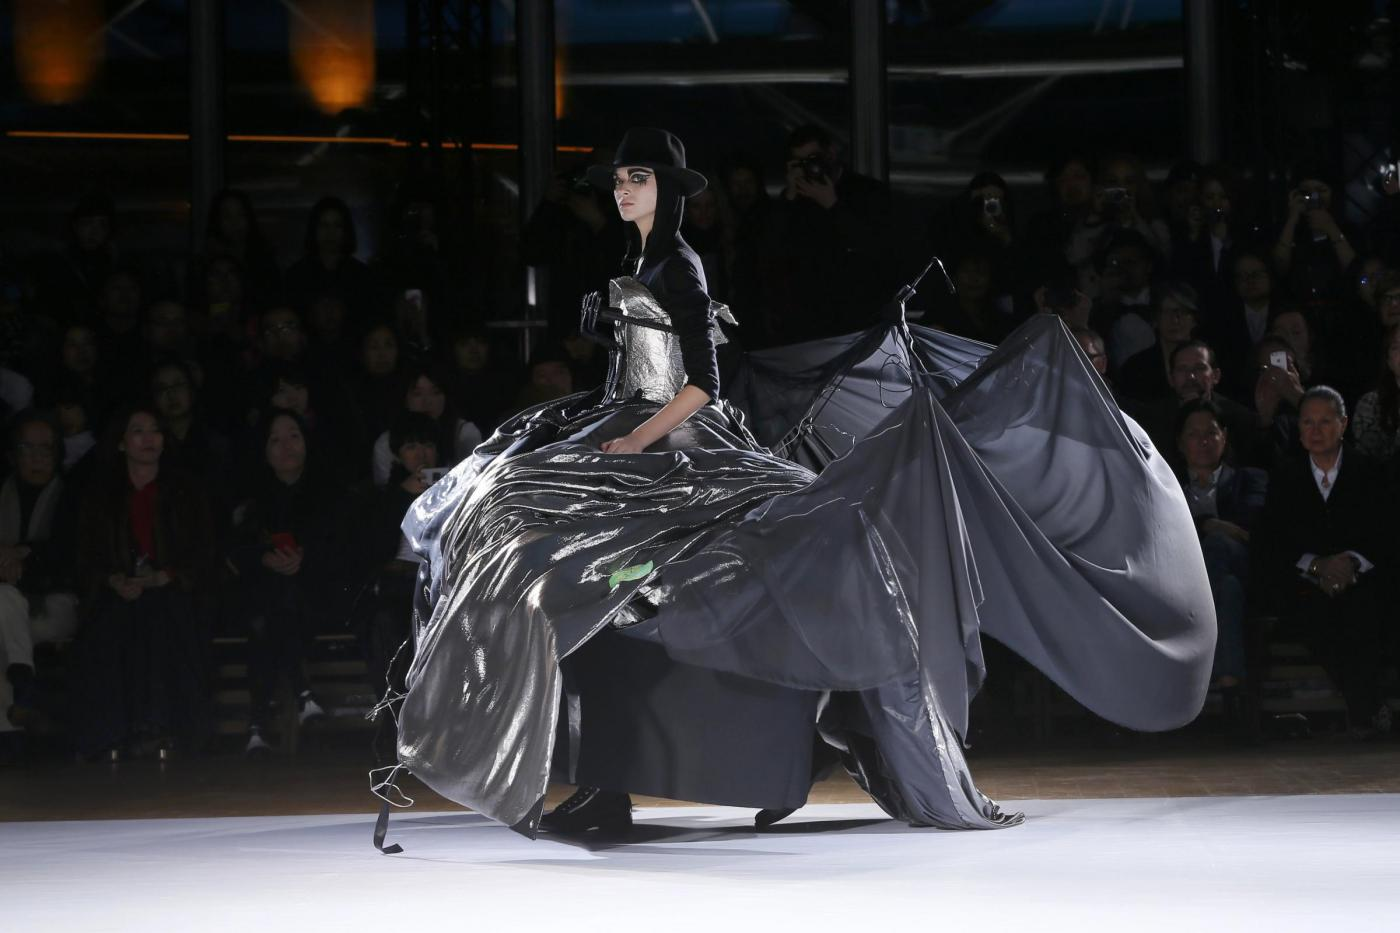 Exposition Art Blog: Avant-garde fashion designer Yohji Yamamoto